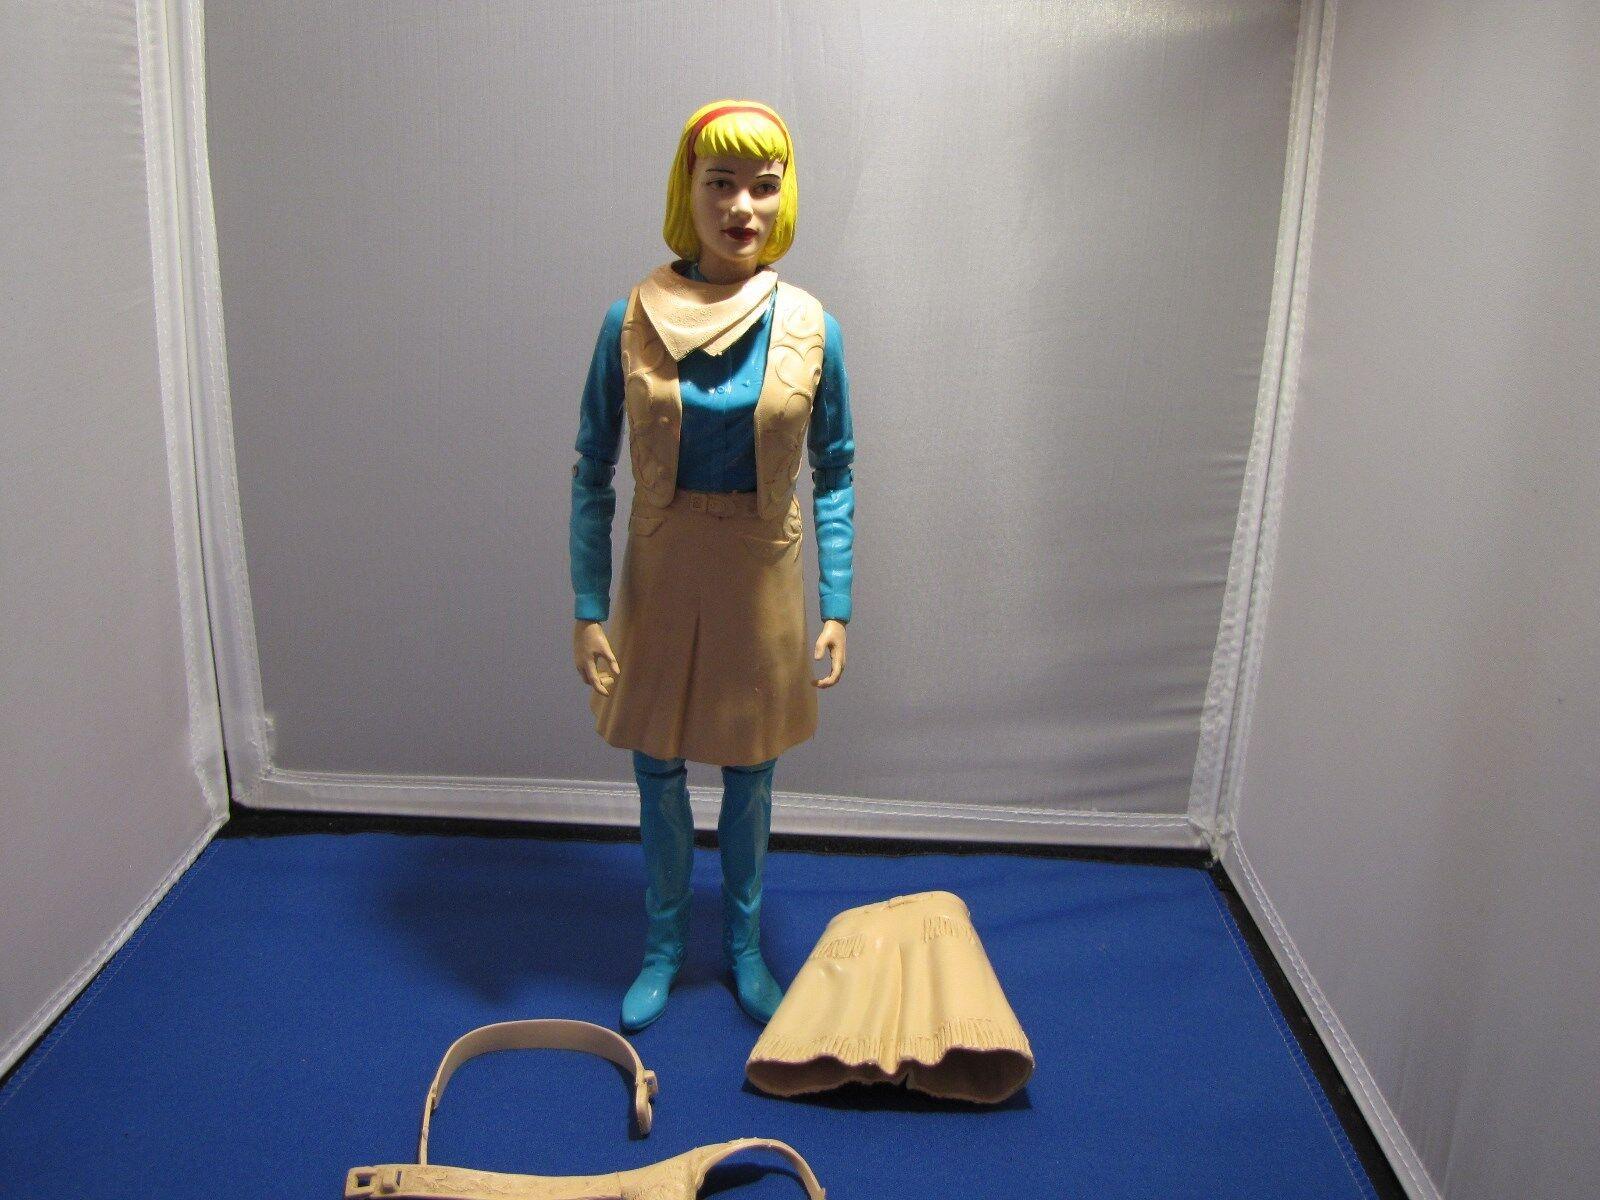 Vintage Marx Johnny West Territory - Jane Jane Jane West Action Figure w  Accessories 4e35ad